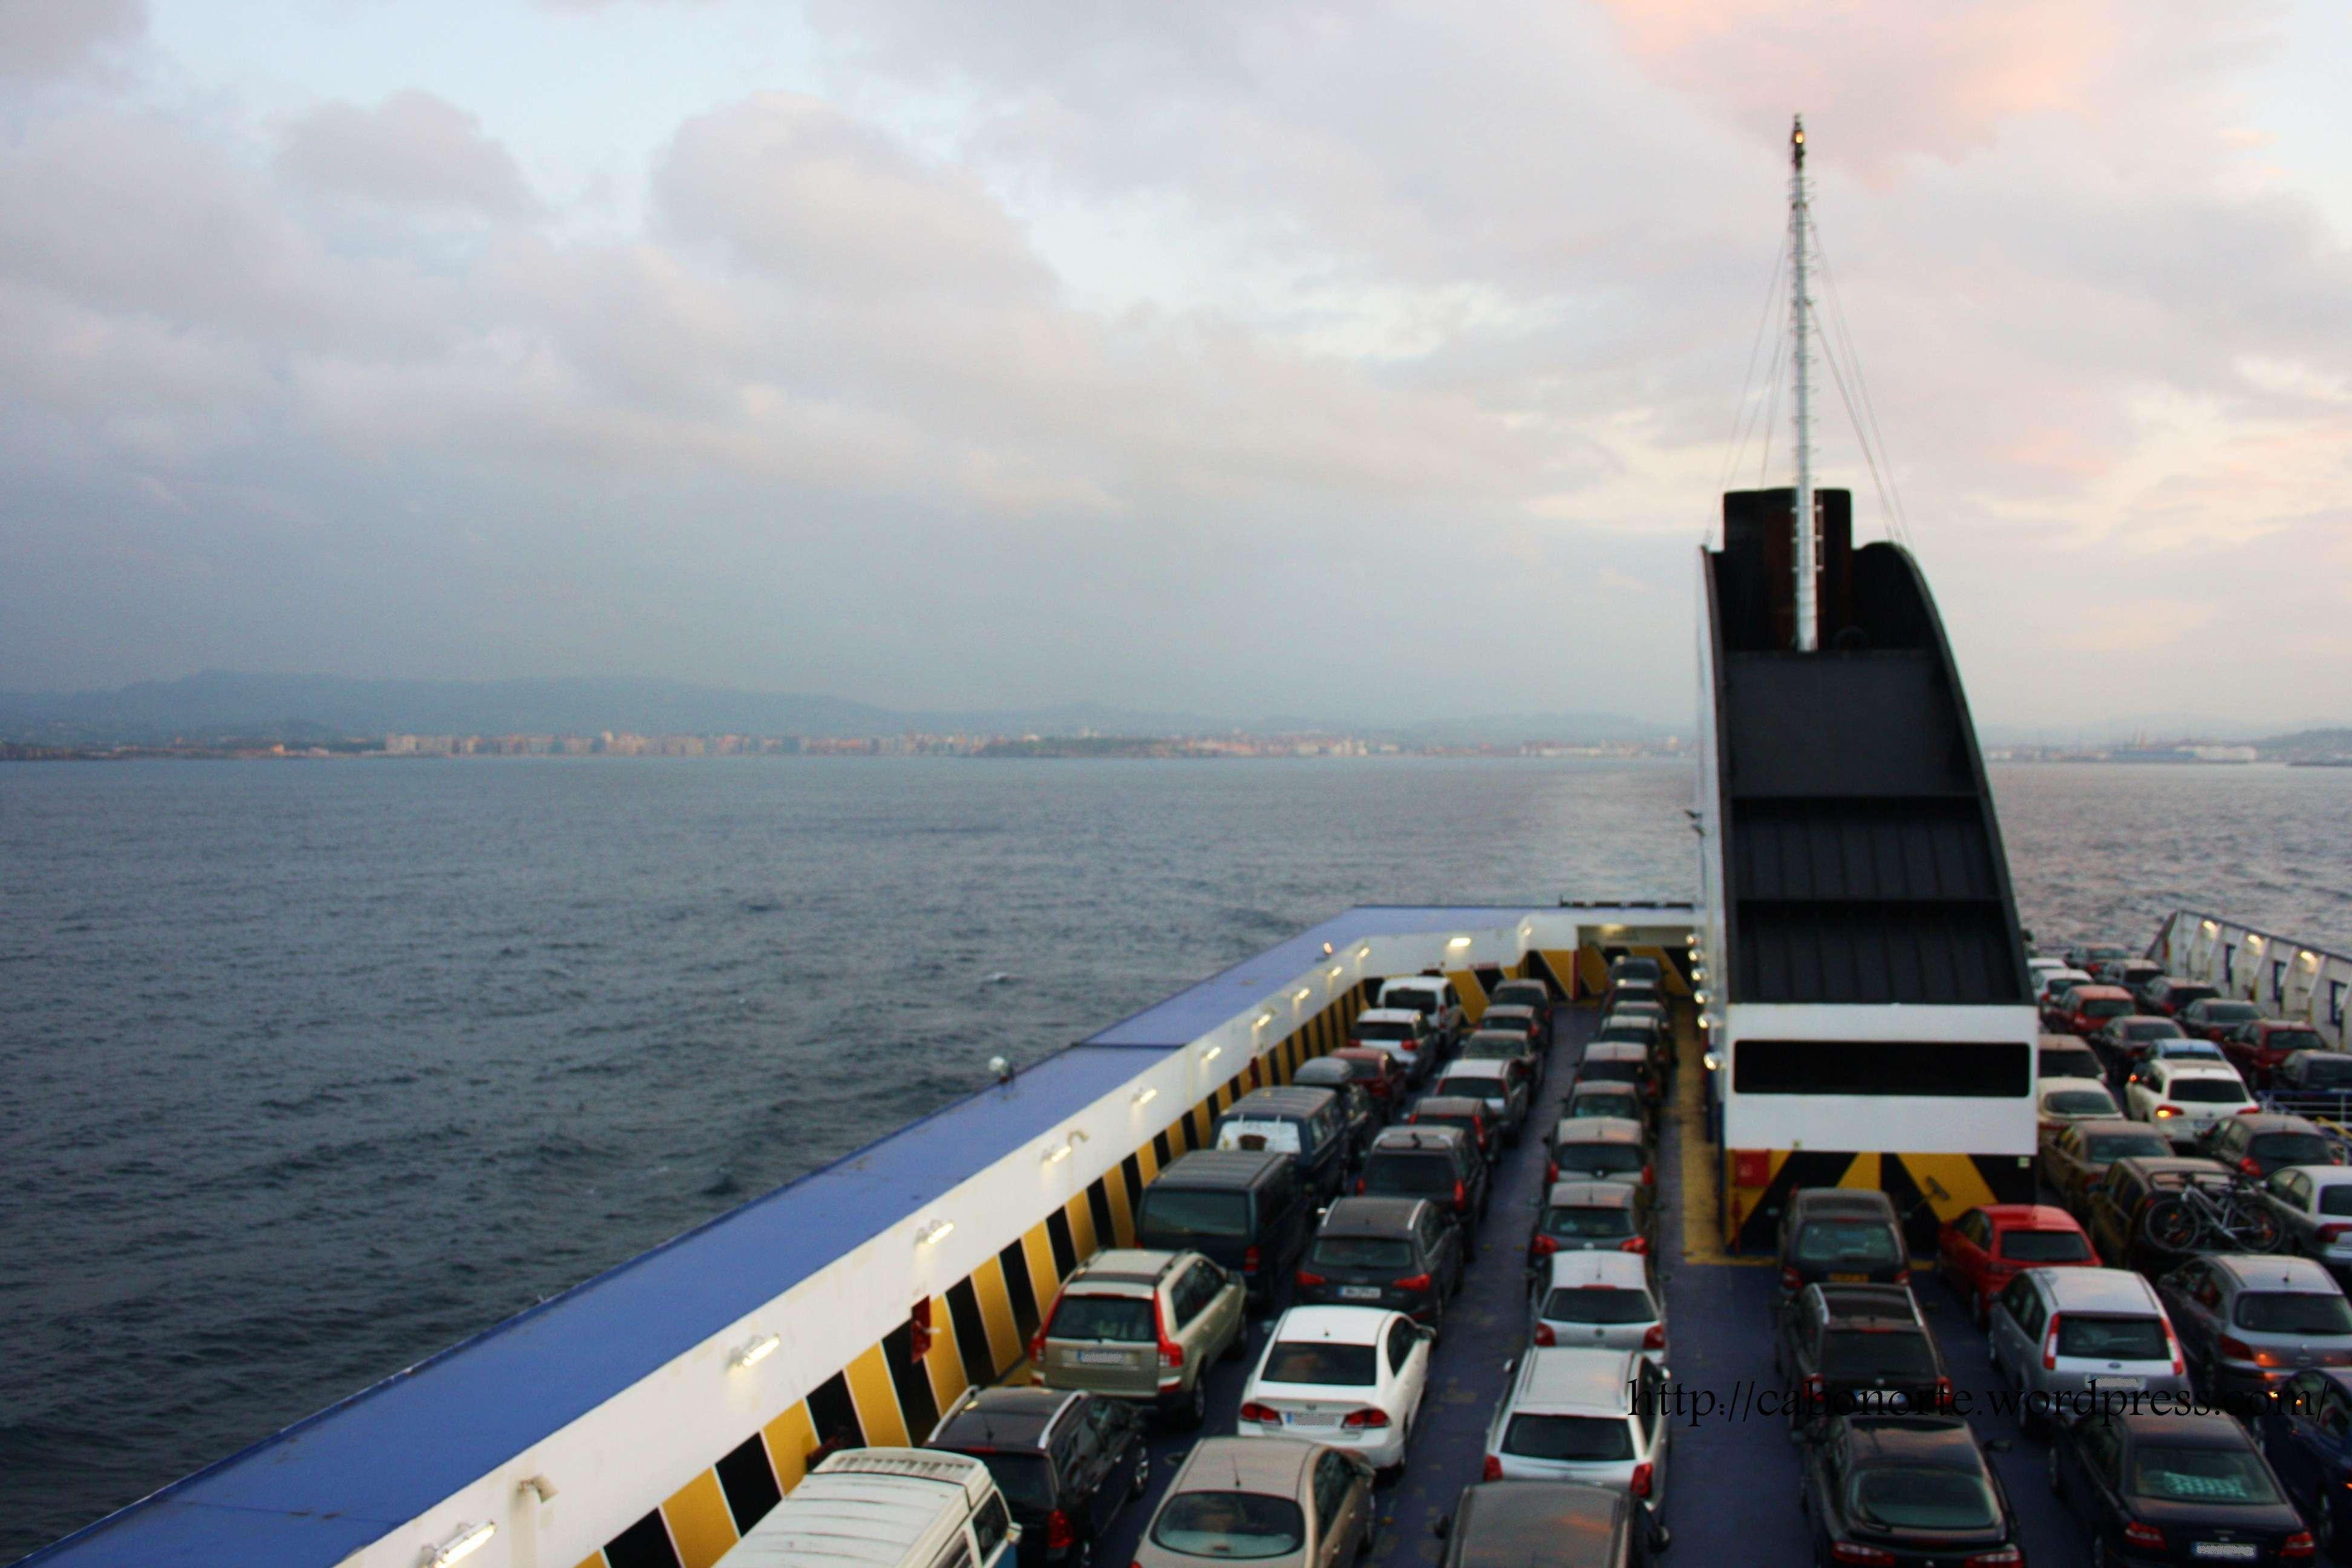 Saliendo de Gijón en el ferry Gijón - St Nazaire